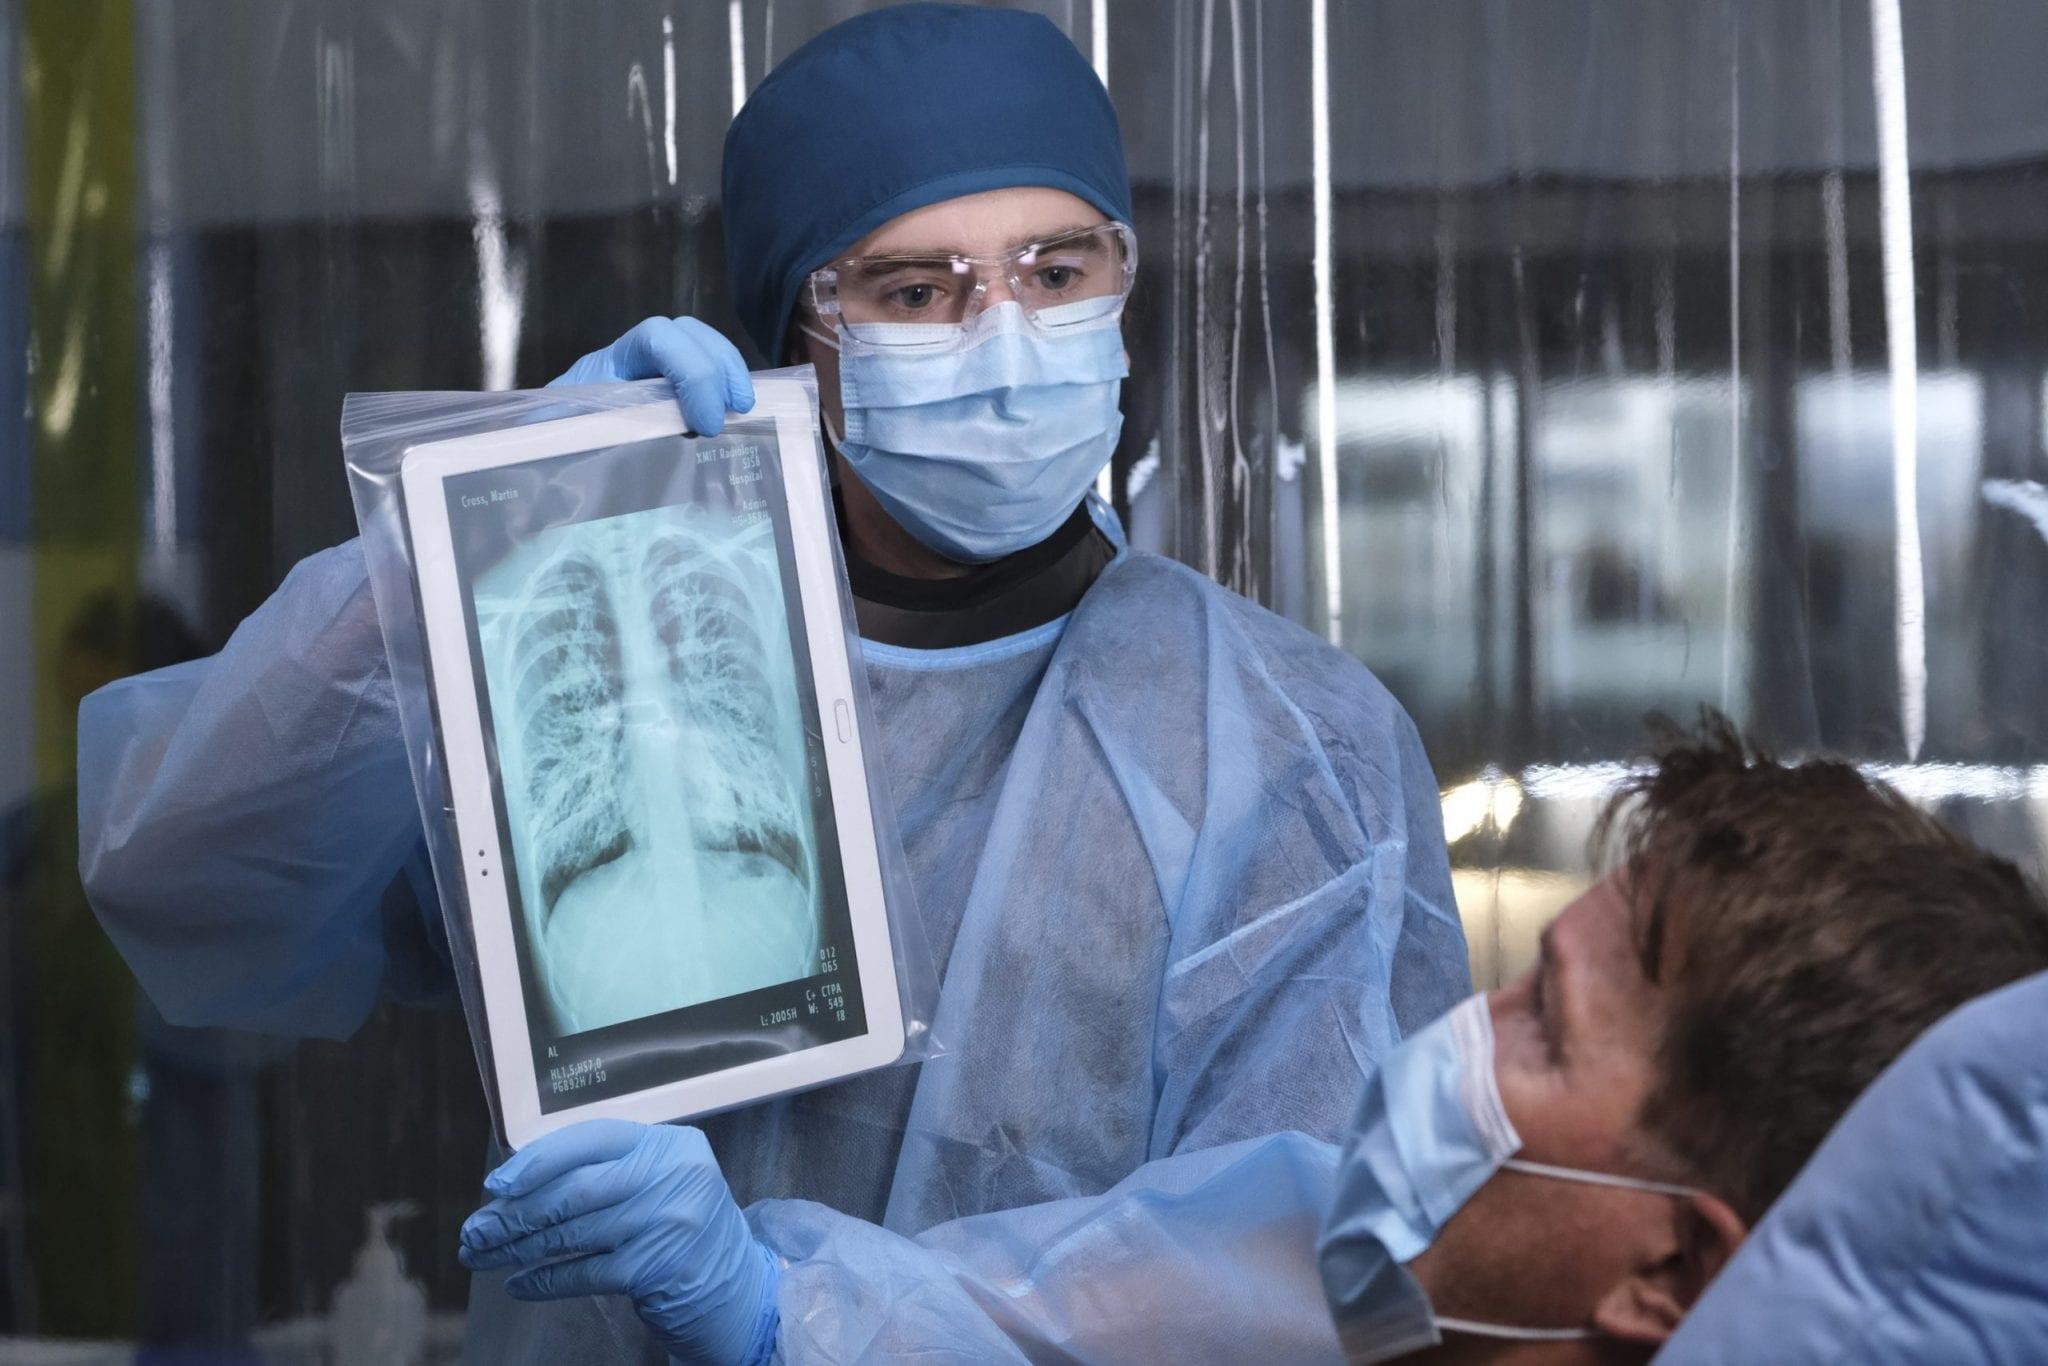 SerieTivu: The Good Doctor 4 prima serata. Con protagonista Freddie Highmore nei panni del dottor Shaun Murphy, in prima visione assoluta su RaiDue